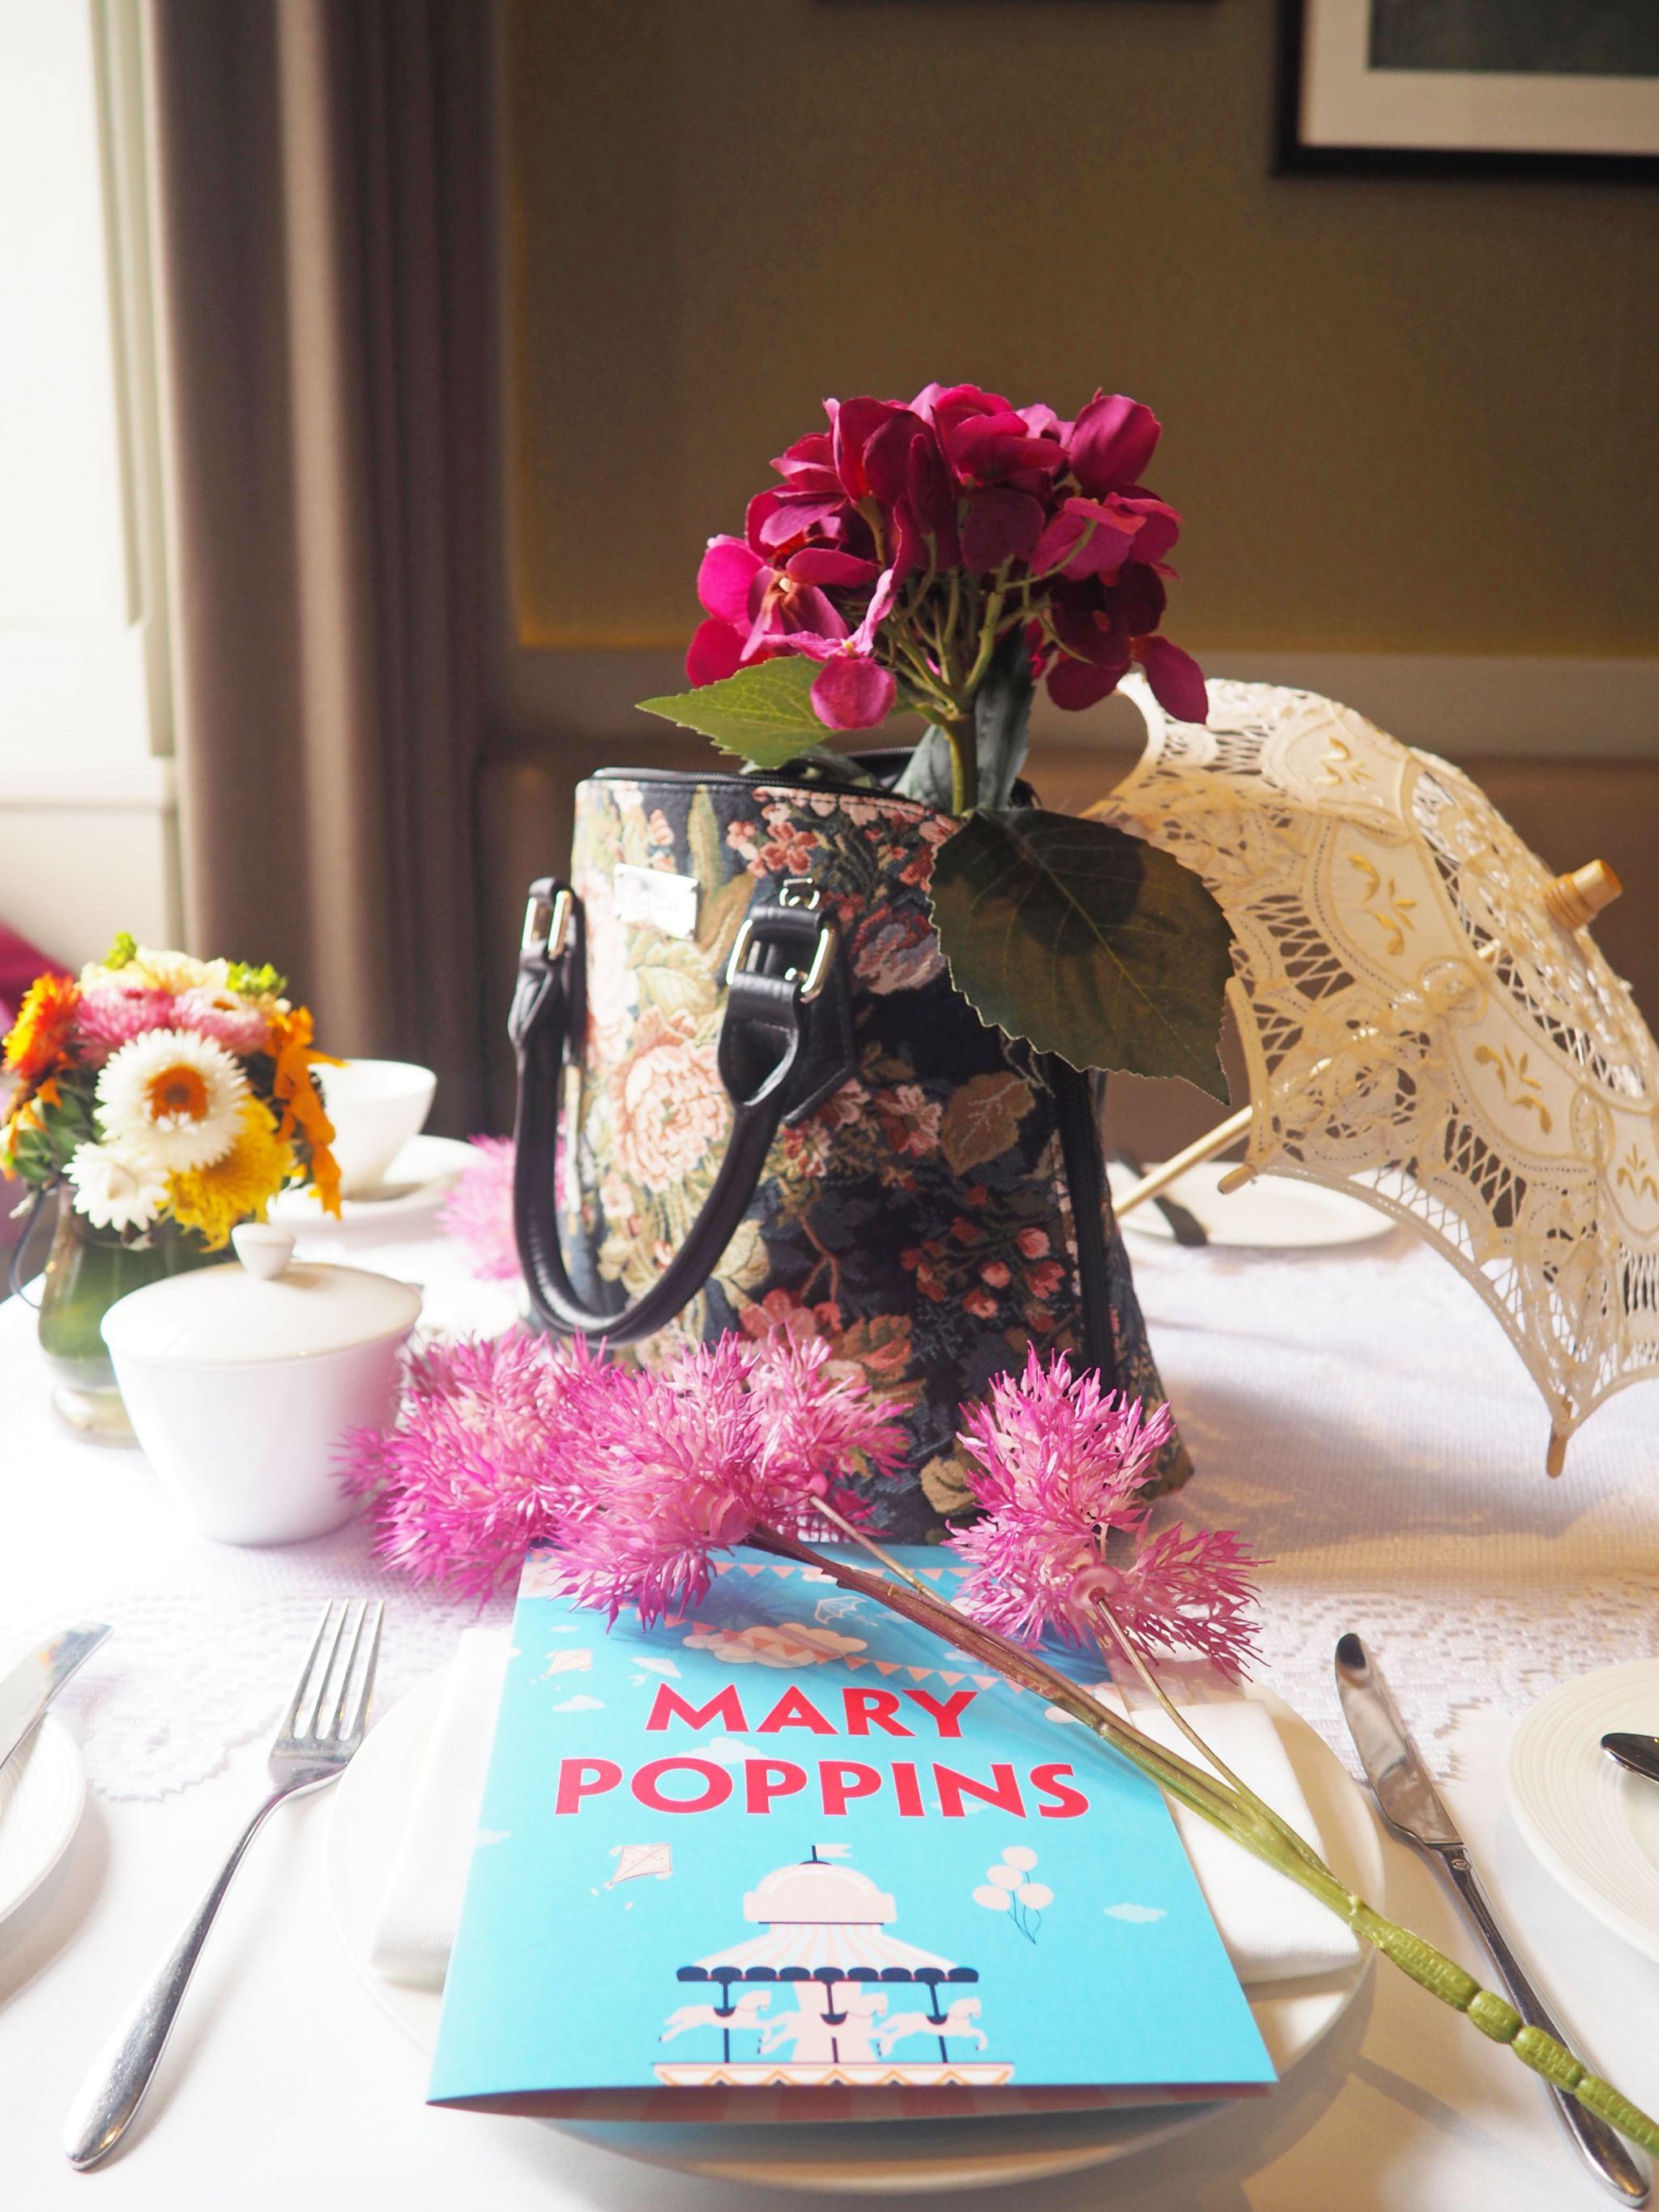 Mary Poppins Afternoon Tea, Taj 51 Buckingham Gate